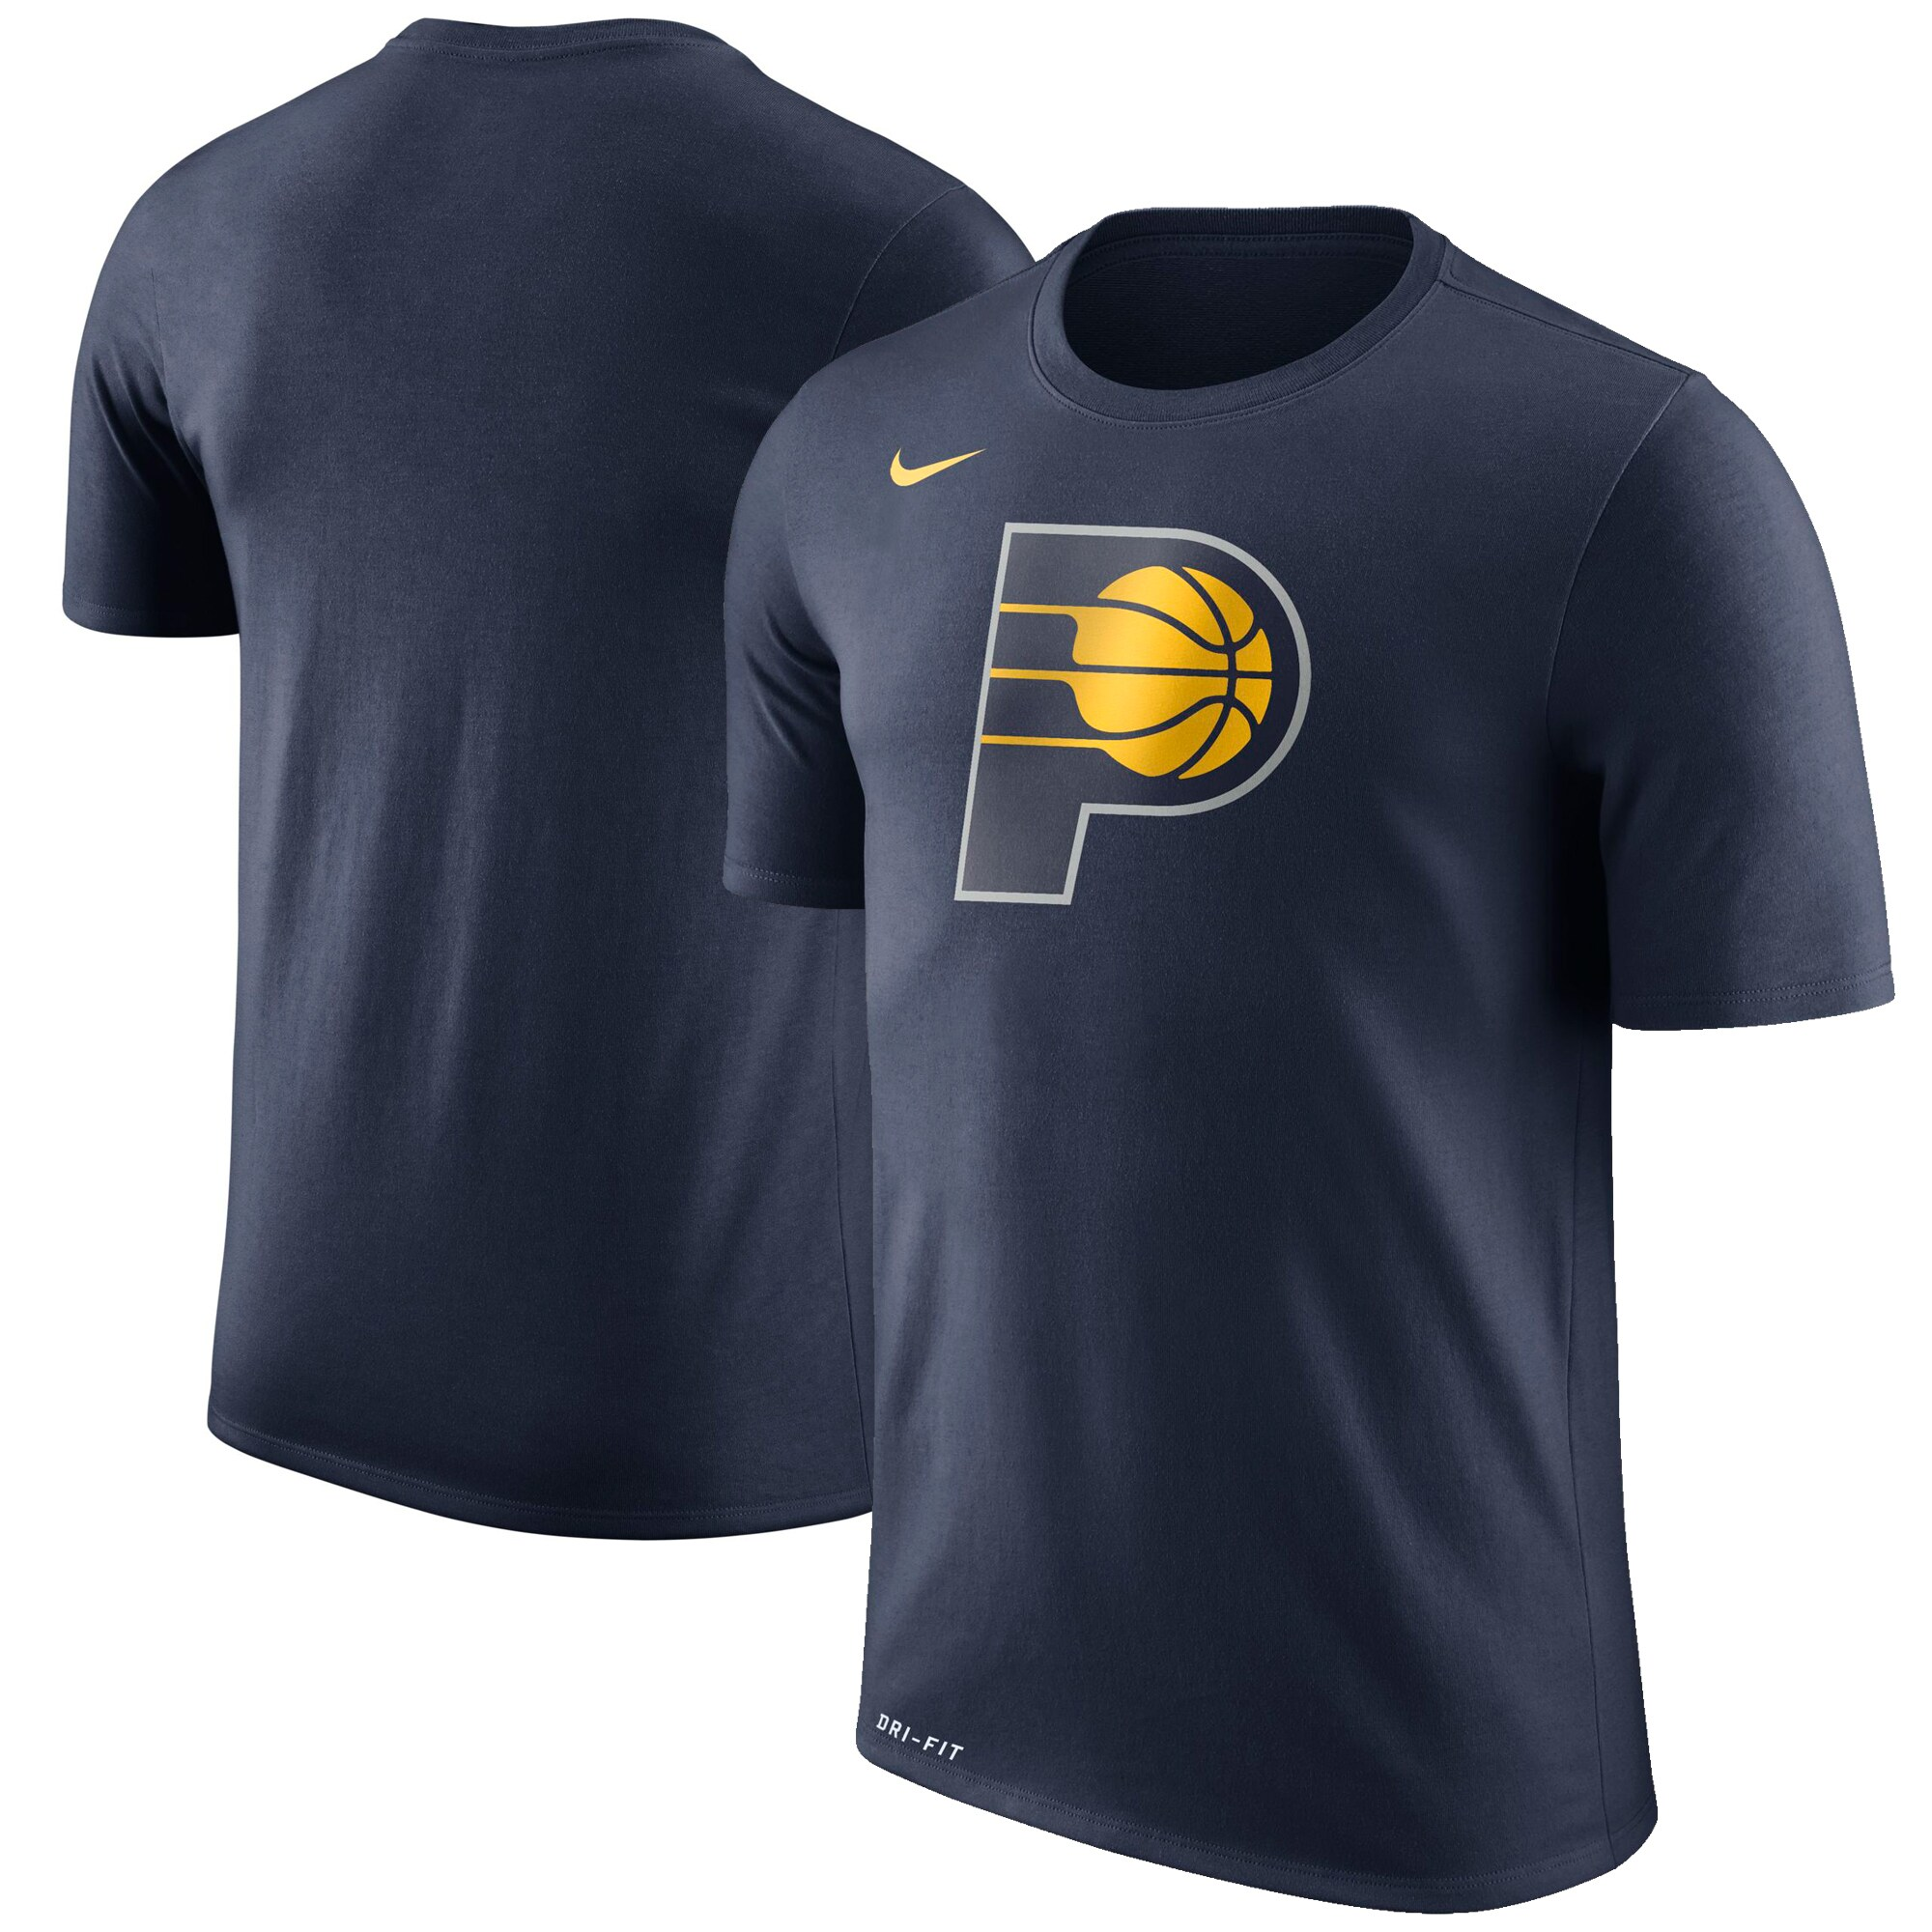 Indiana Pacers Nike Logo T-Shirt - Navy